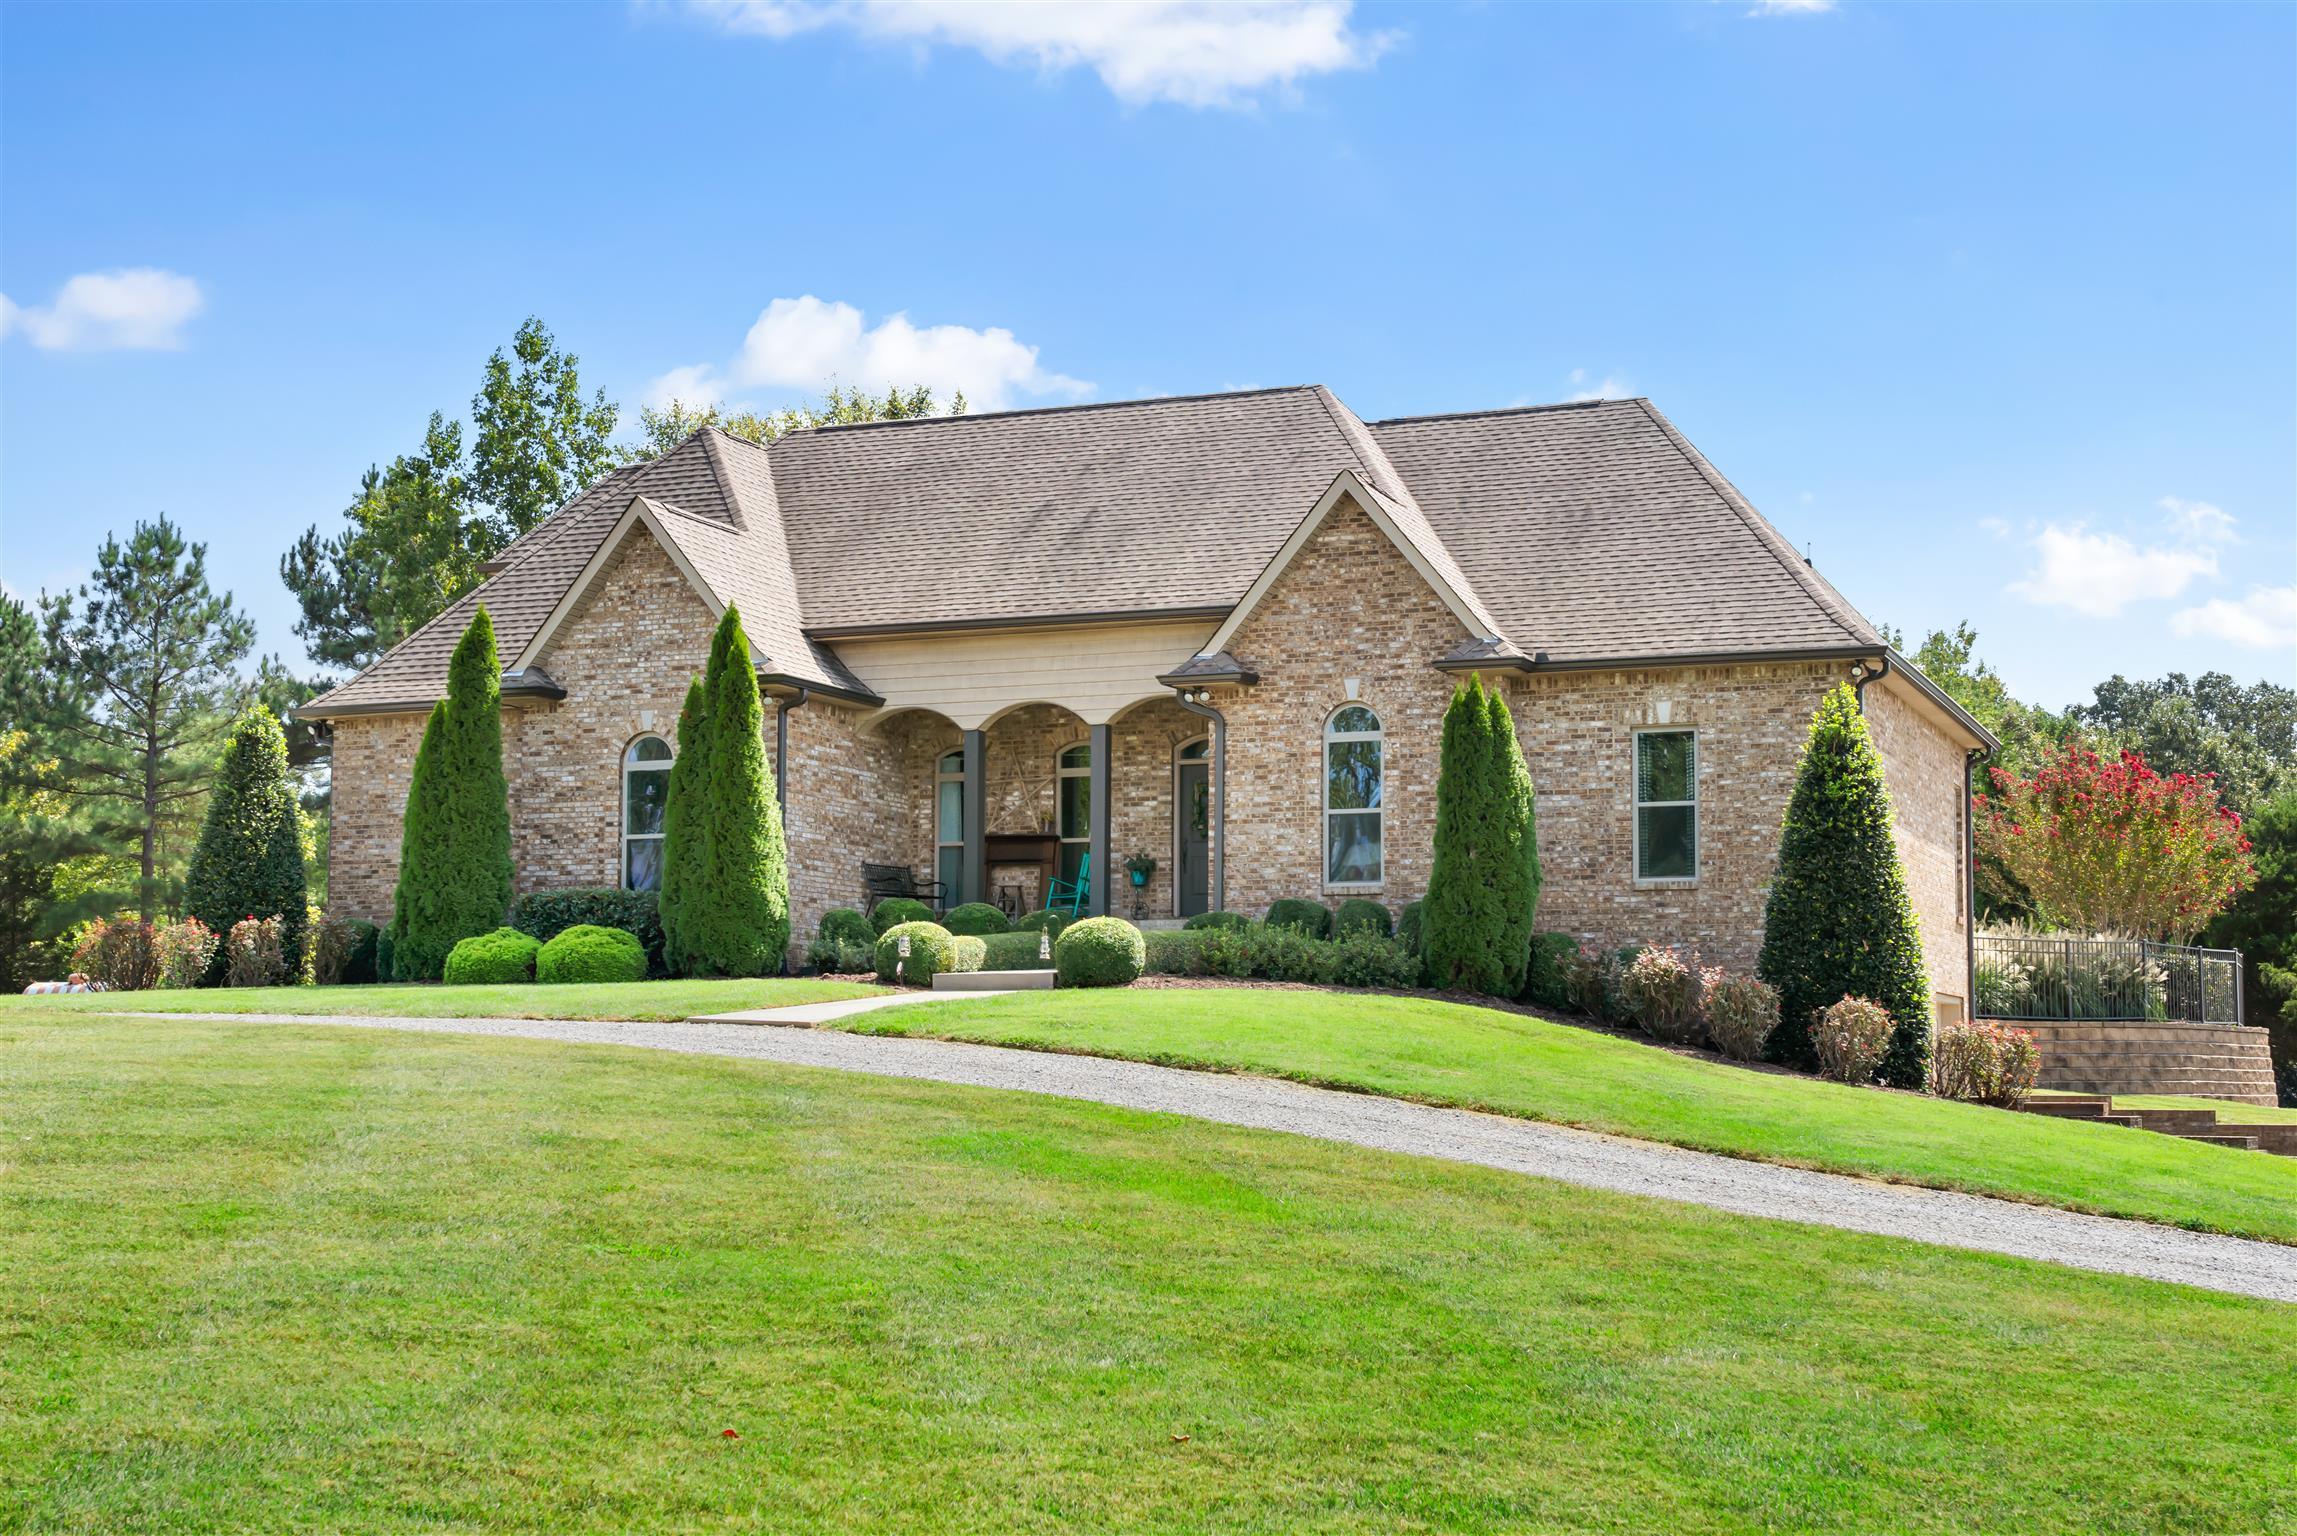 2844 N Hinton Rd, Clarksville, TN 37043 - Clarksville, TN real estate listing